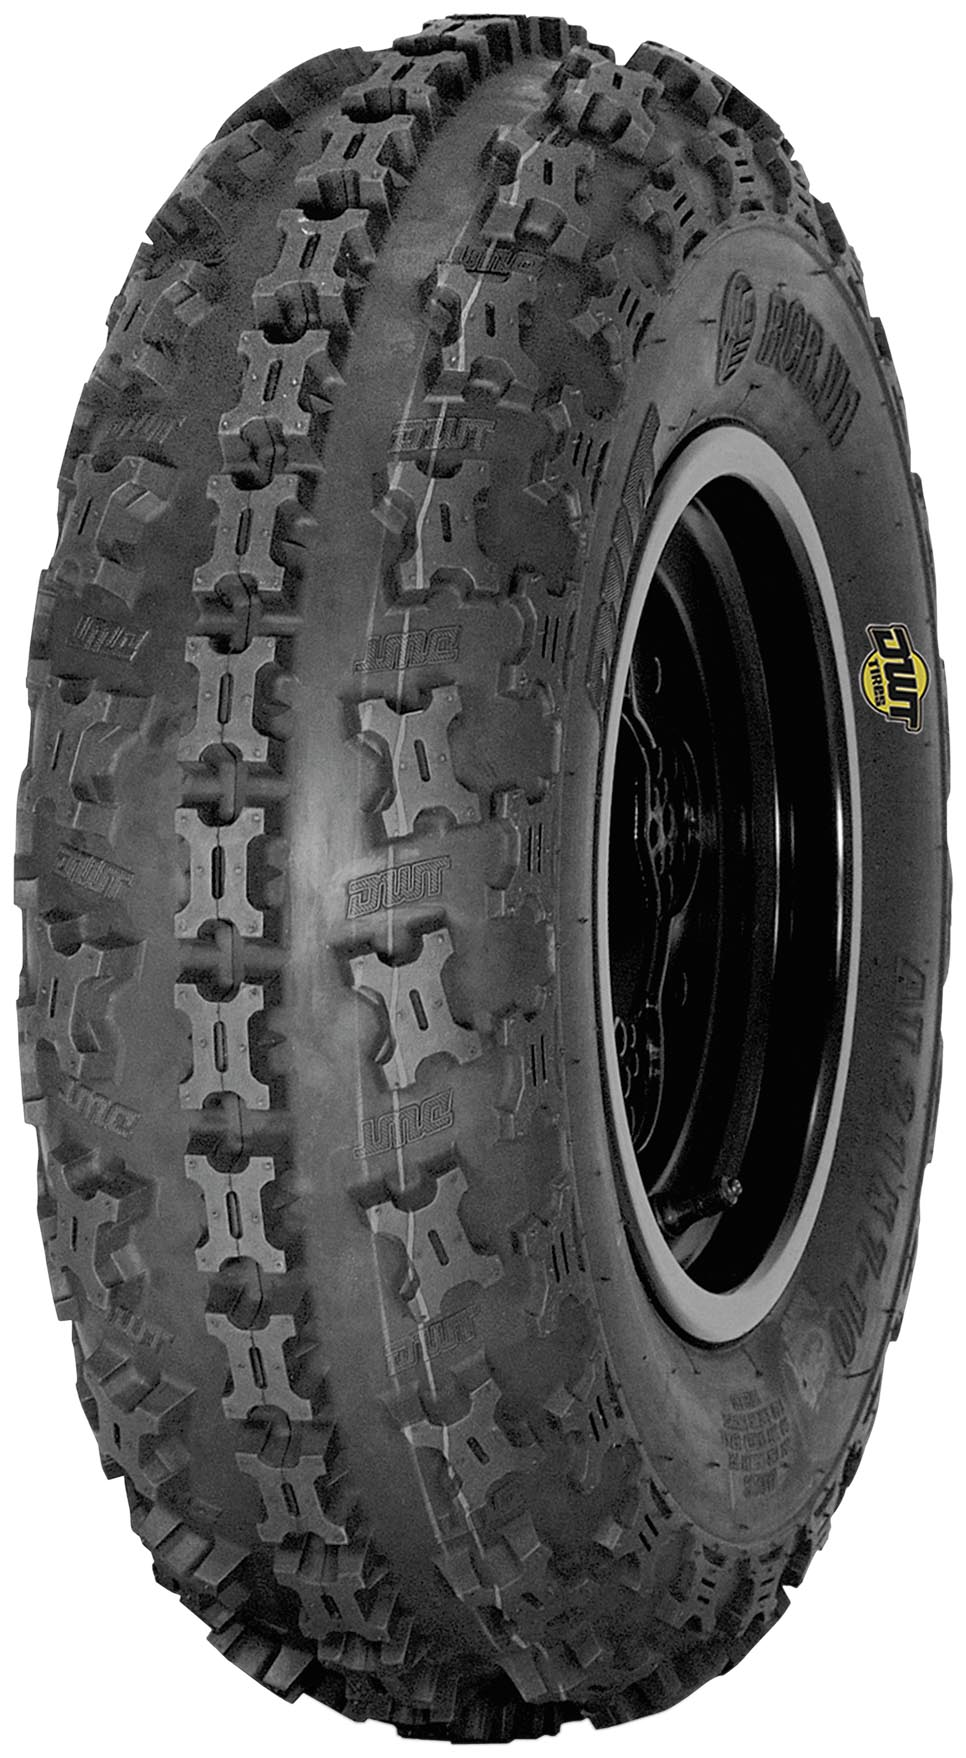 XC V2 Tire